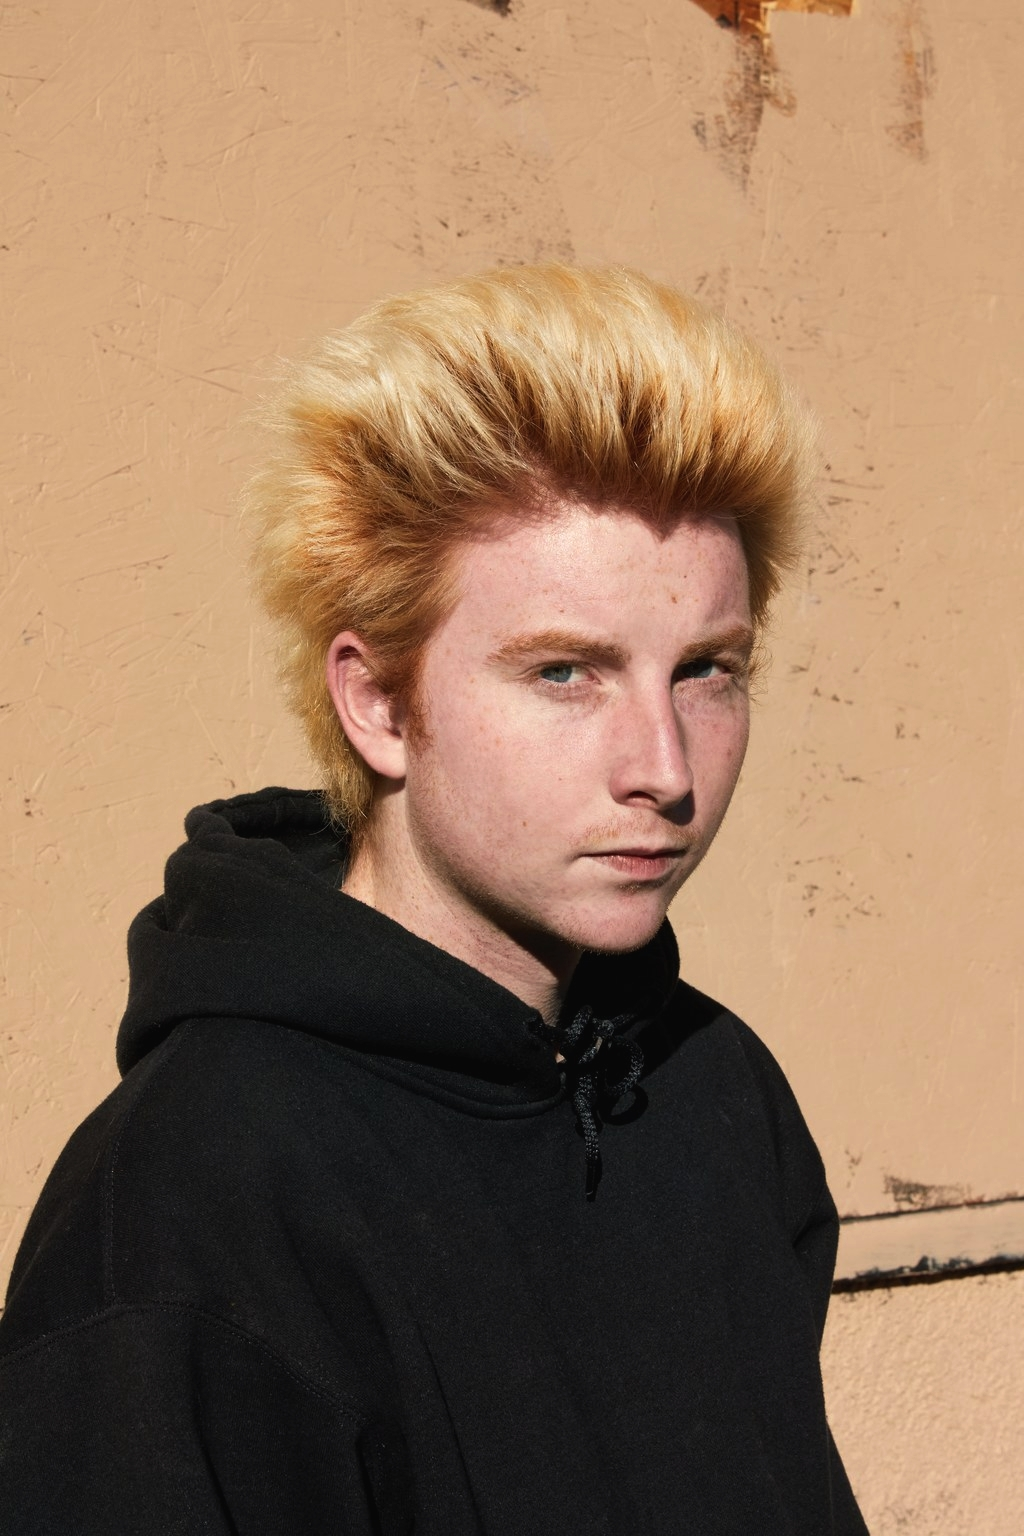 Джейсон Дилл - от увлечения скейтбордингом до Fucking Awesome